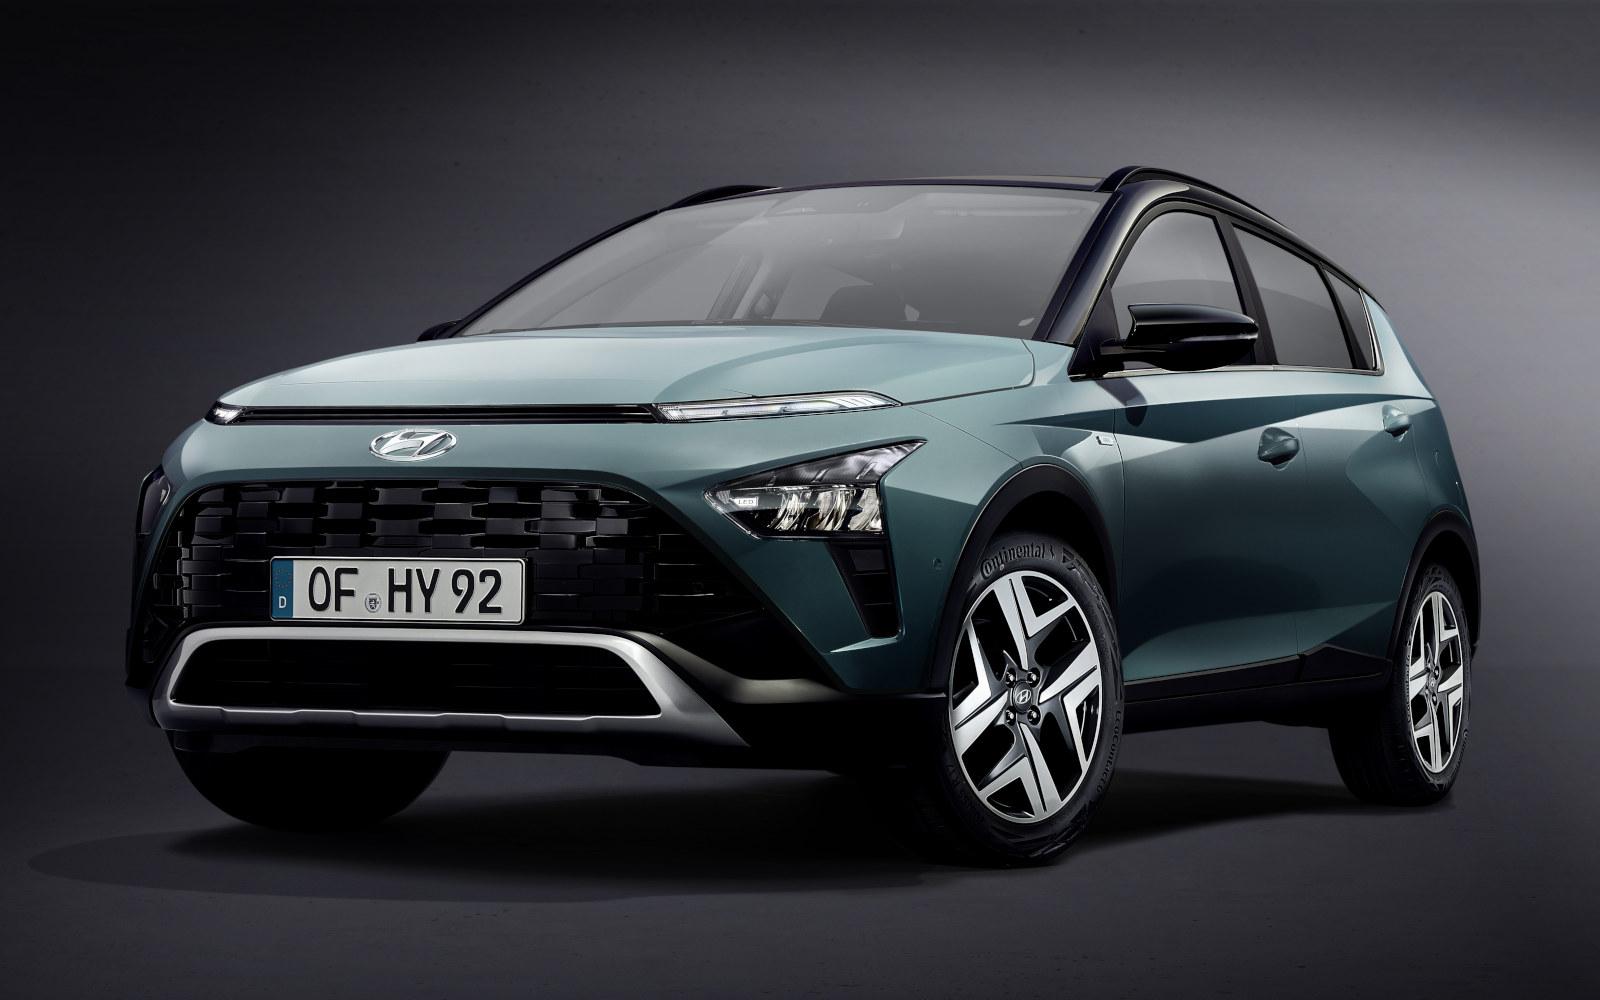 Svelata la nuova Hyundai BAYON: tutti i dettagli.